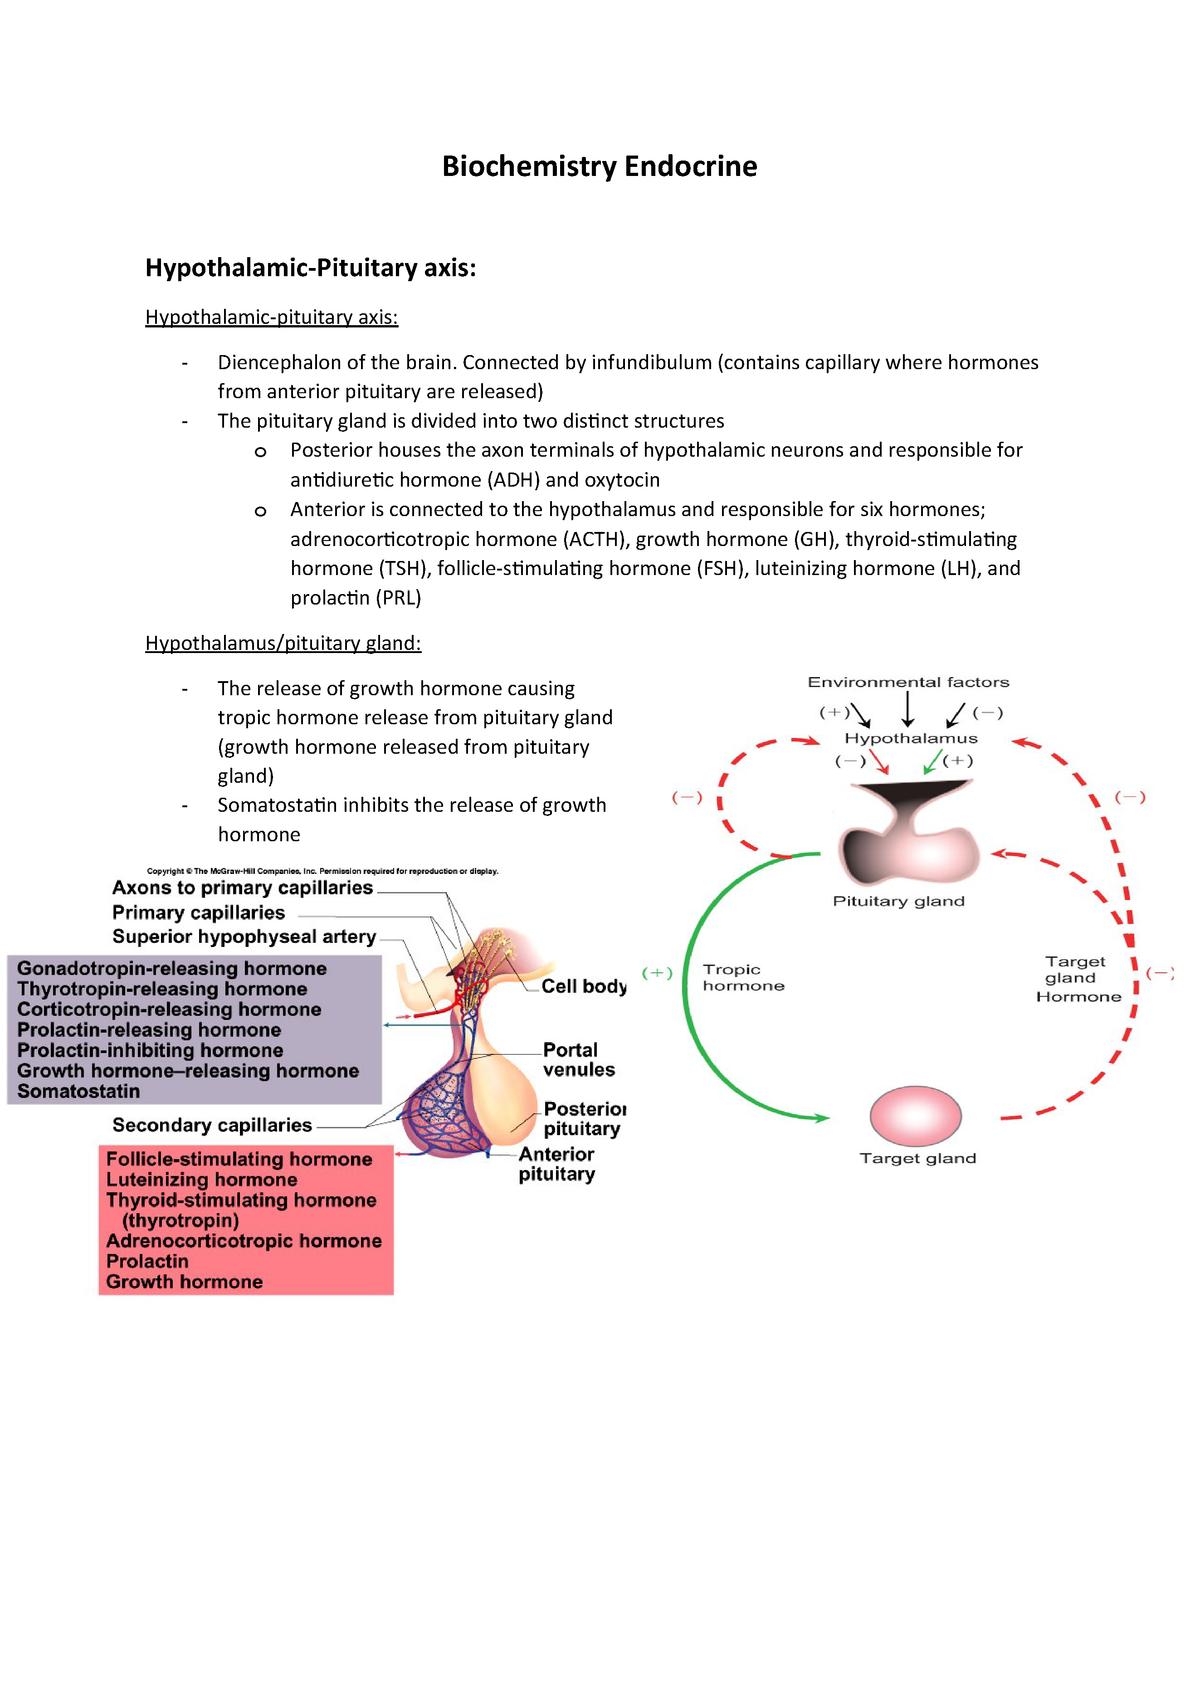 Hypothalamus Pituitary Axis Summary Studocu An example is adh (antidiuretic hormone) which decreases blood pressure. hypothalamus pituitary axis summary